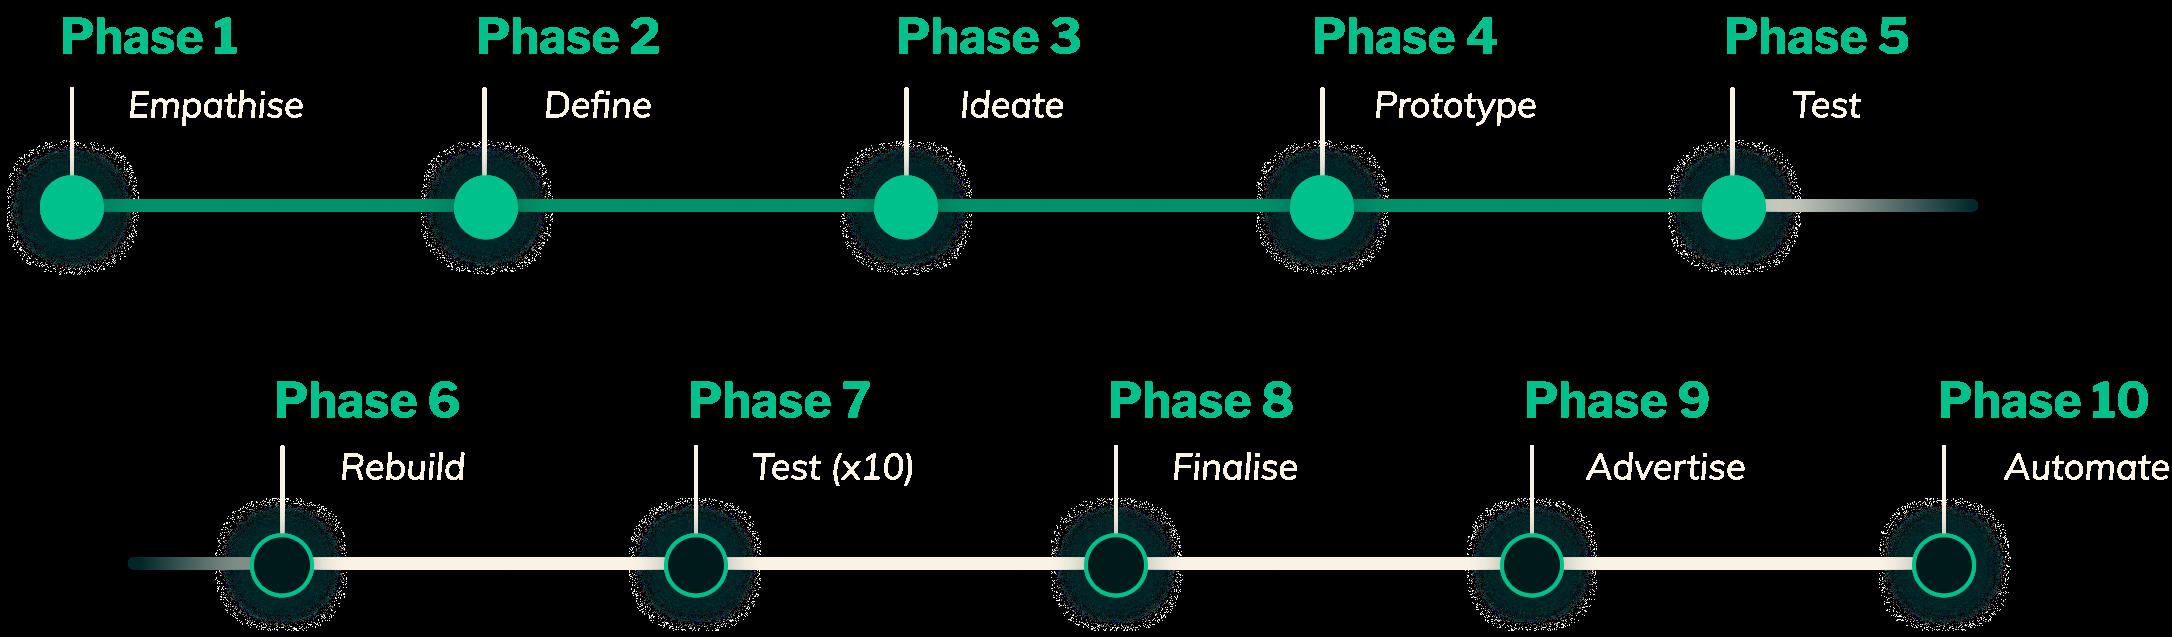 WeFuture Development Phase